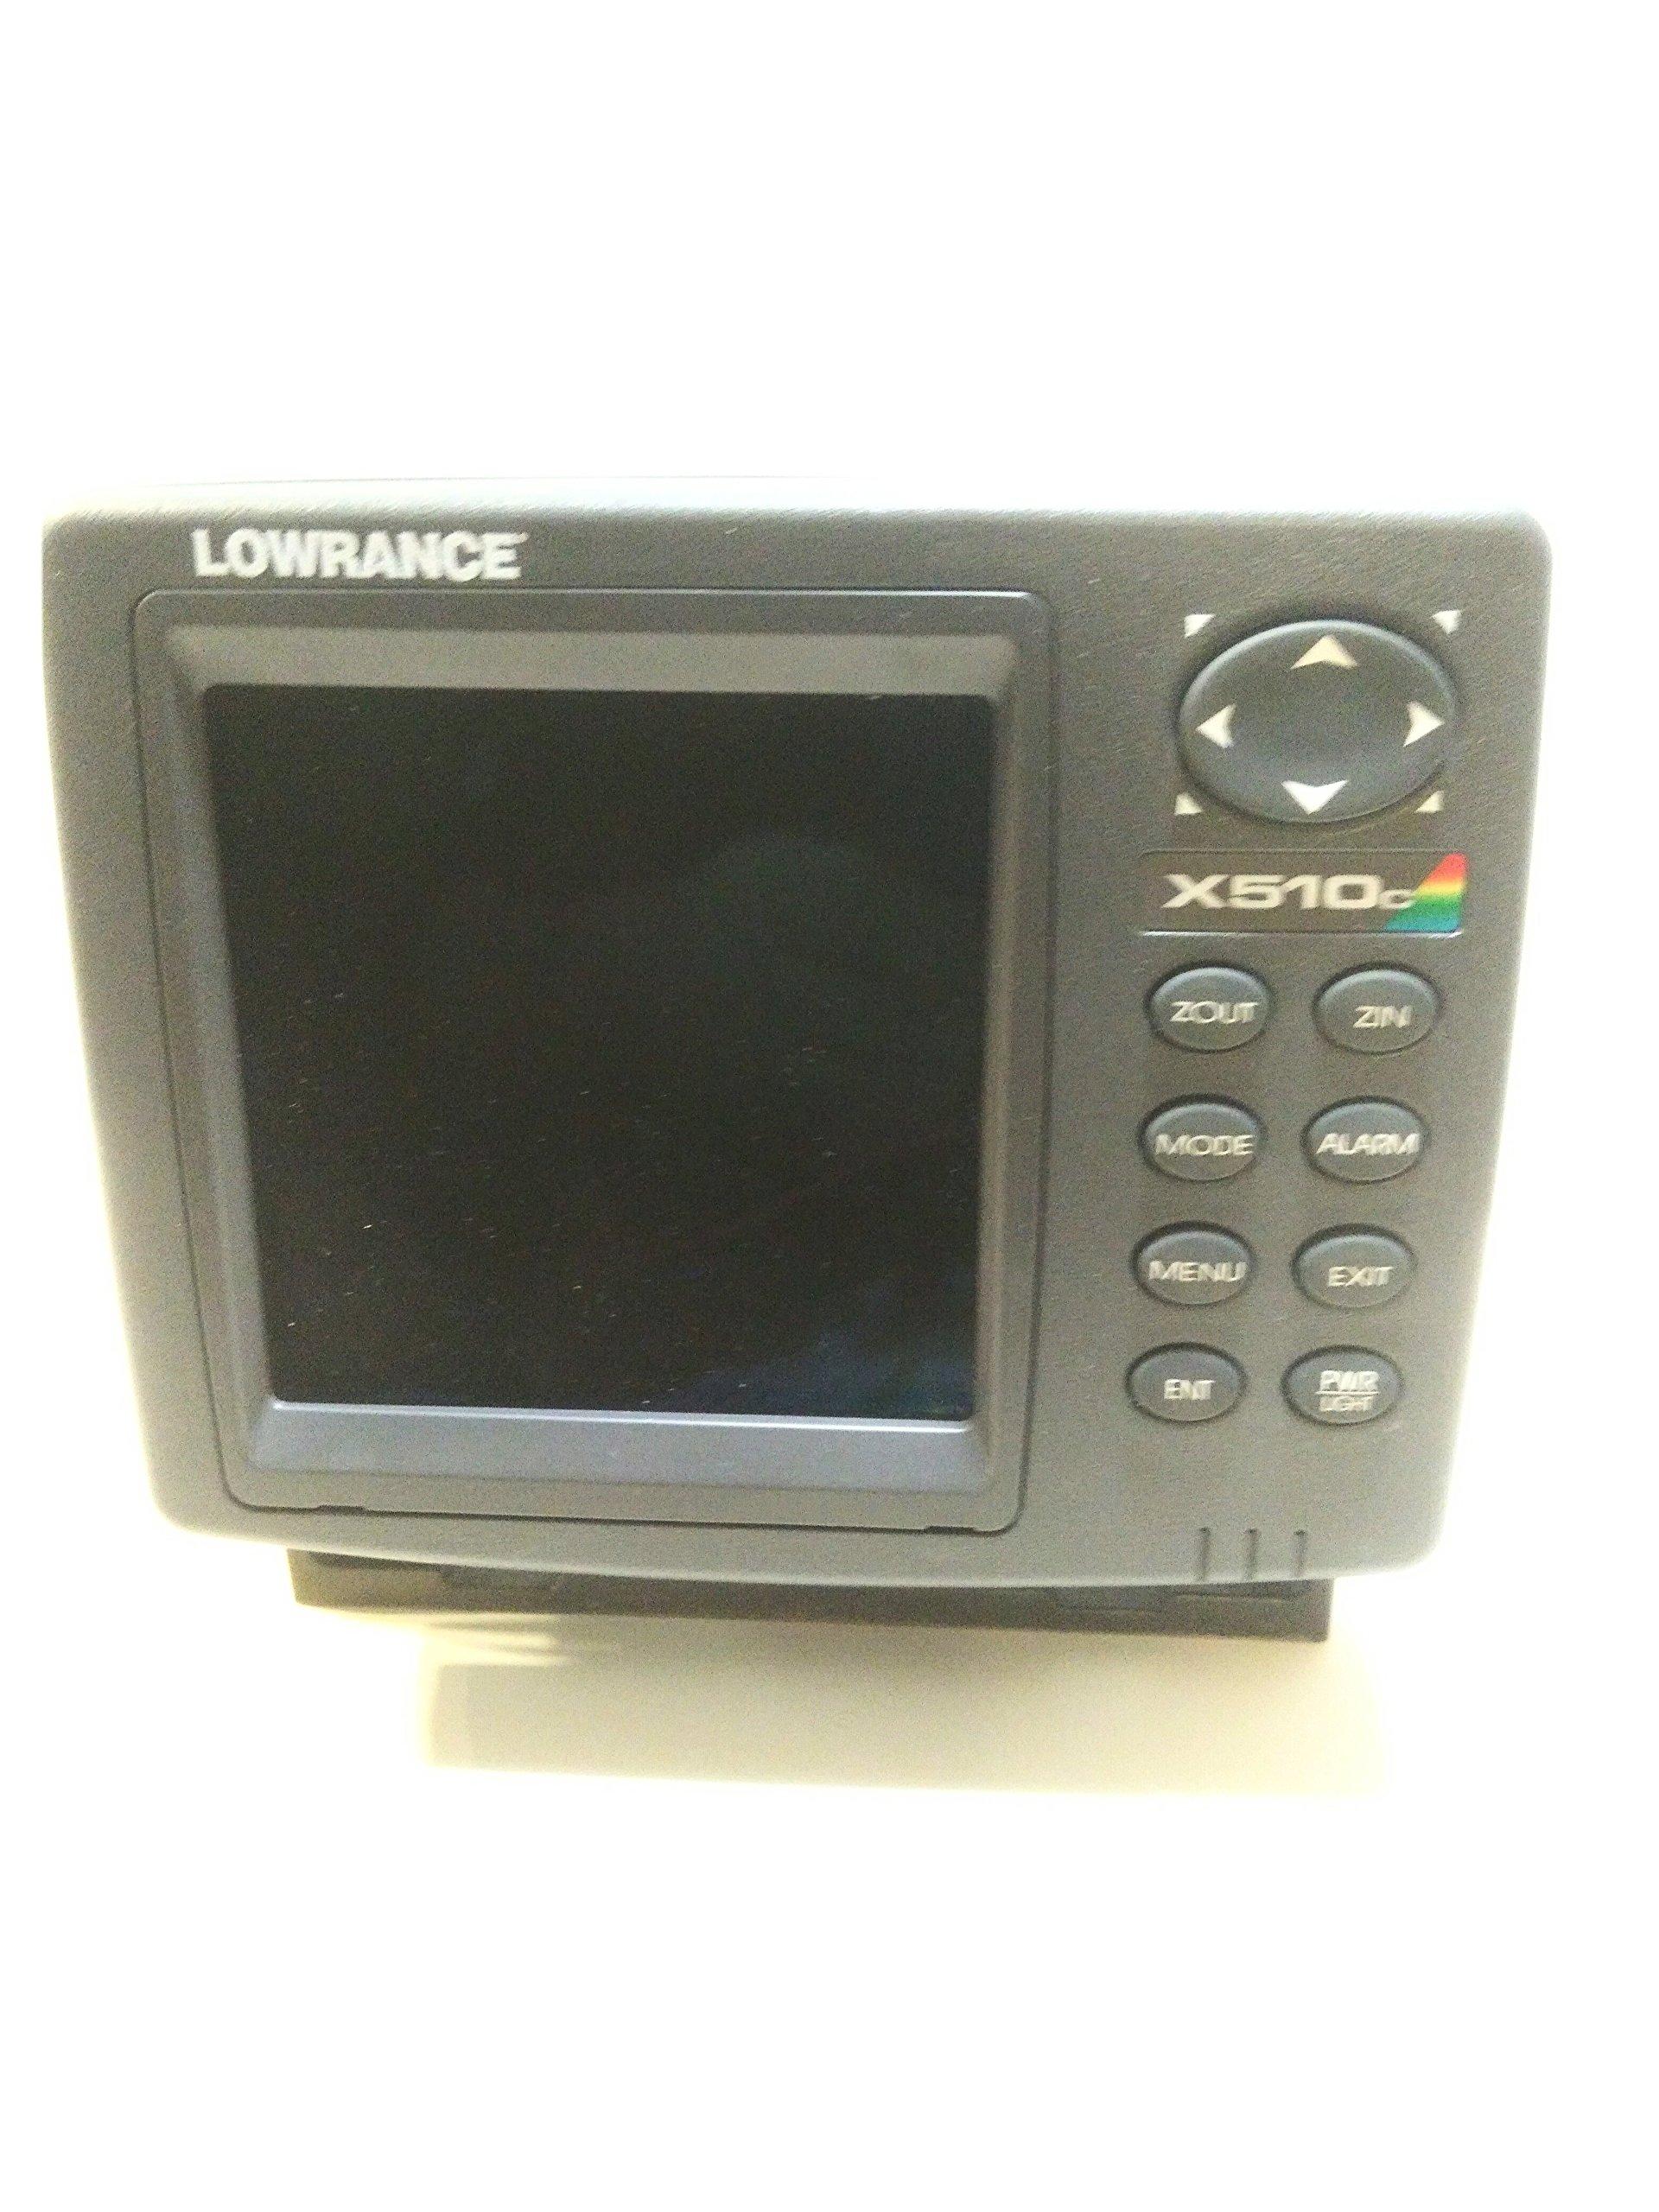 Lowrance 124-57 GB-19 Gimbal Bracket for HDS-5 Fishfinder Units